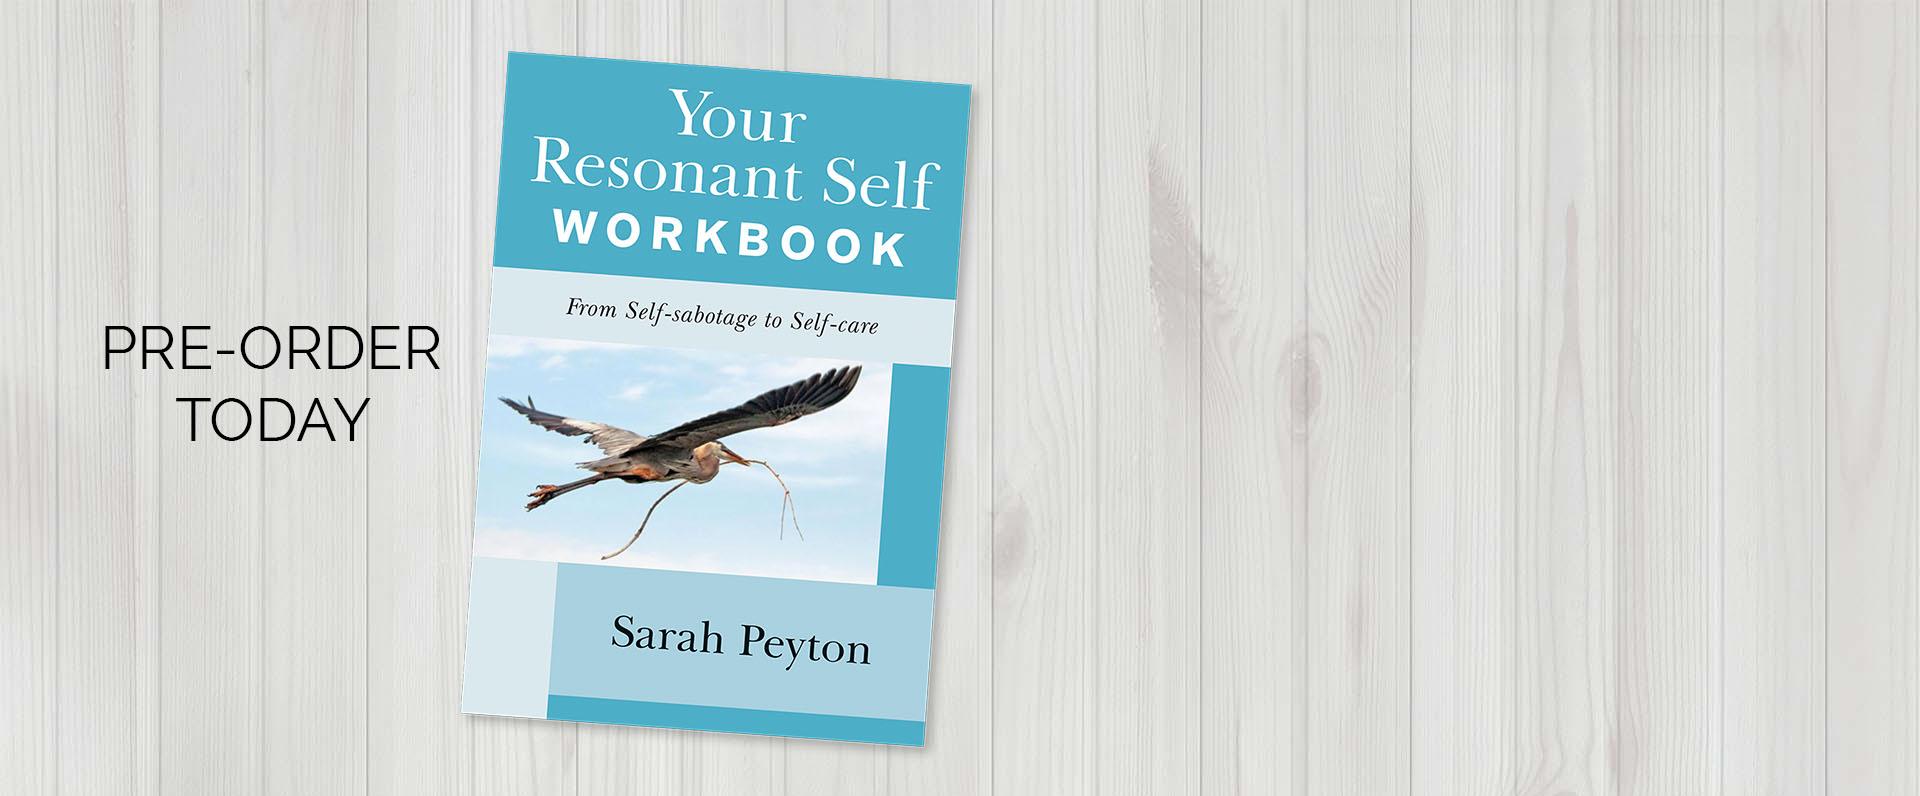 Sarah Peyton Your Resonant Self Workbook Pre-order Header